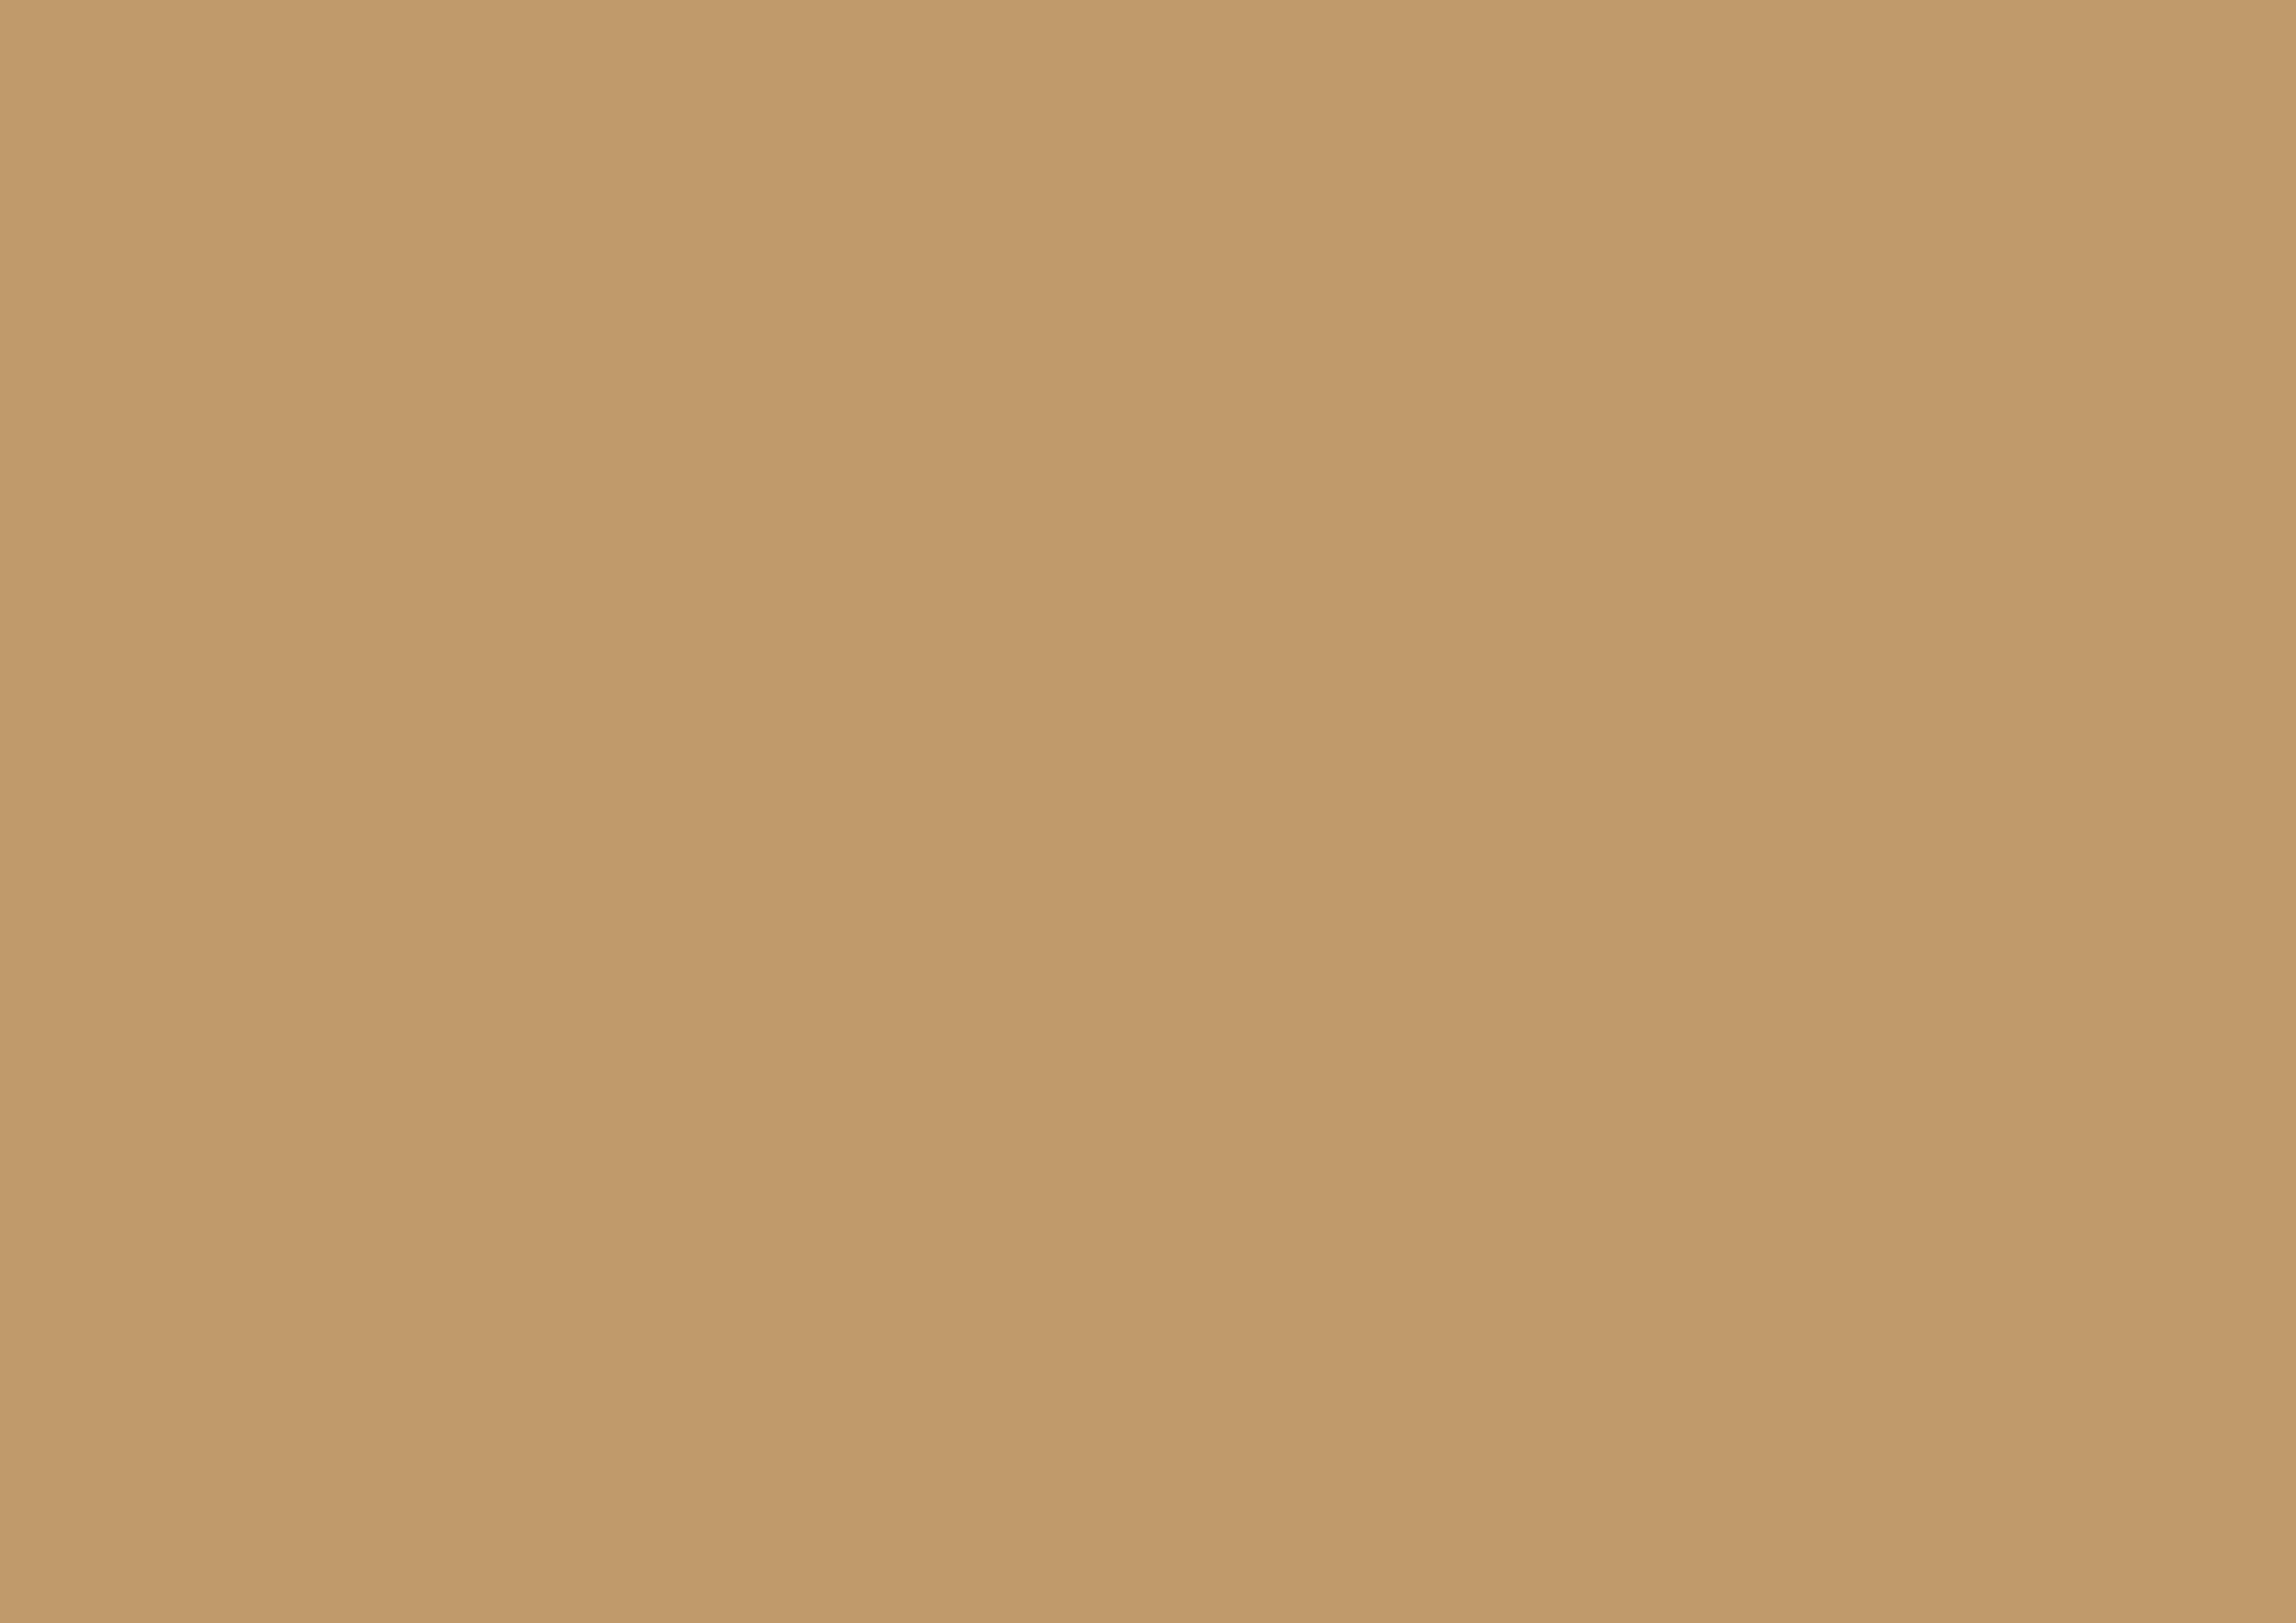 3508x2480 Lion Solid Color Background